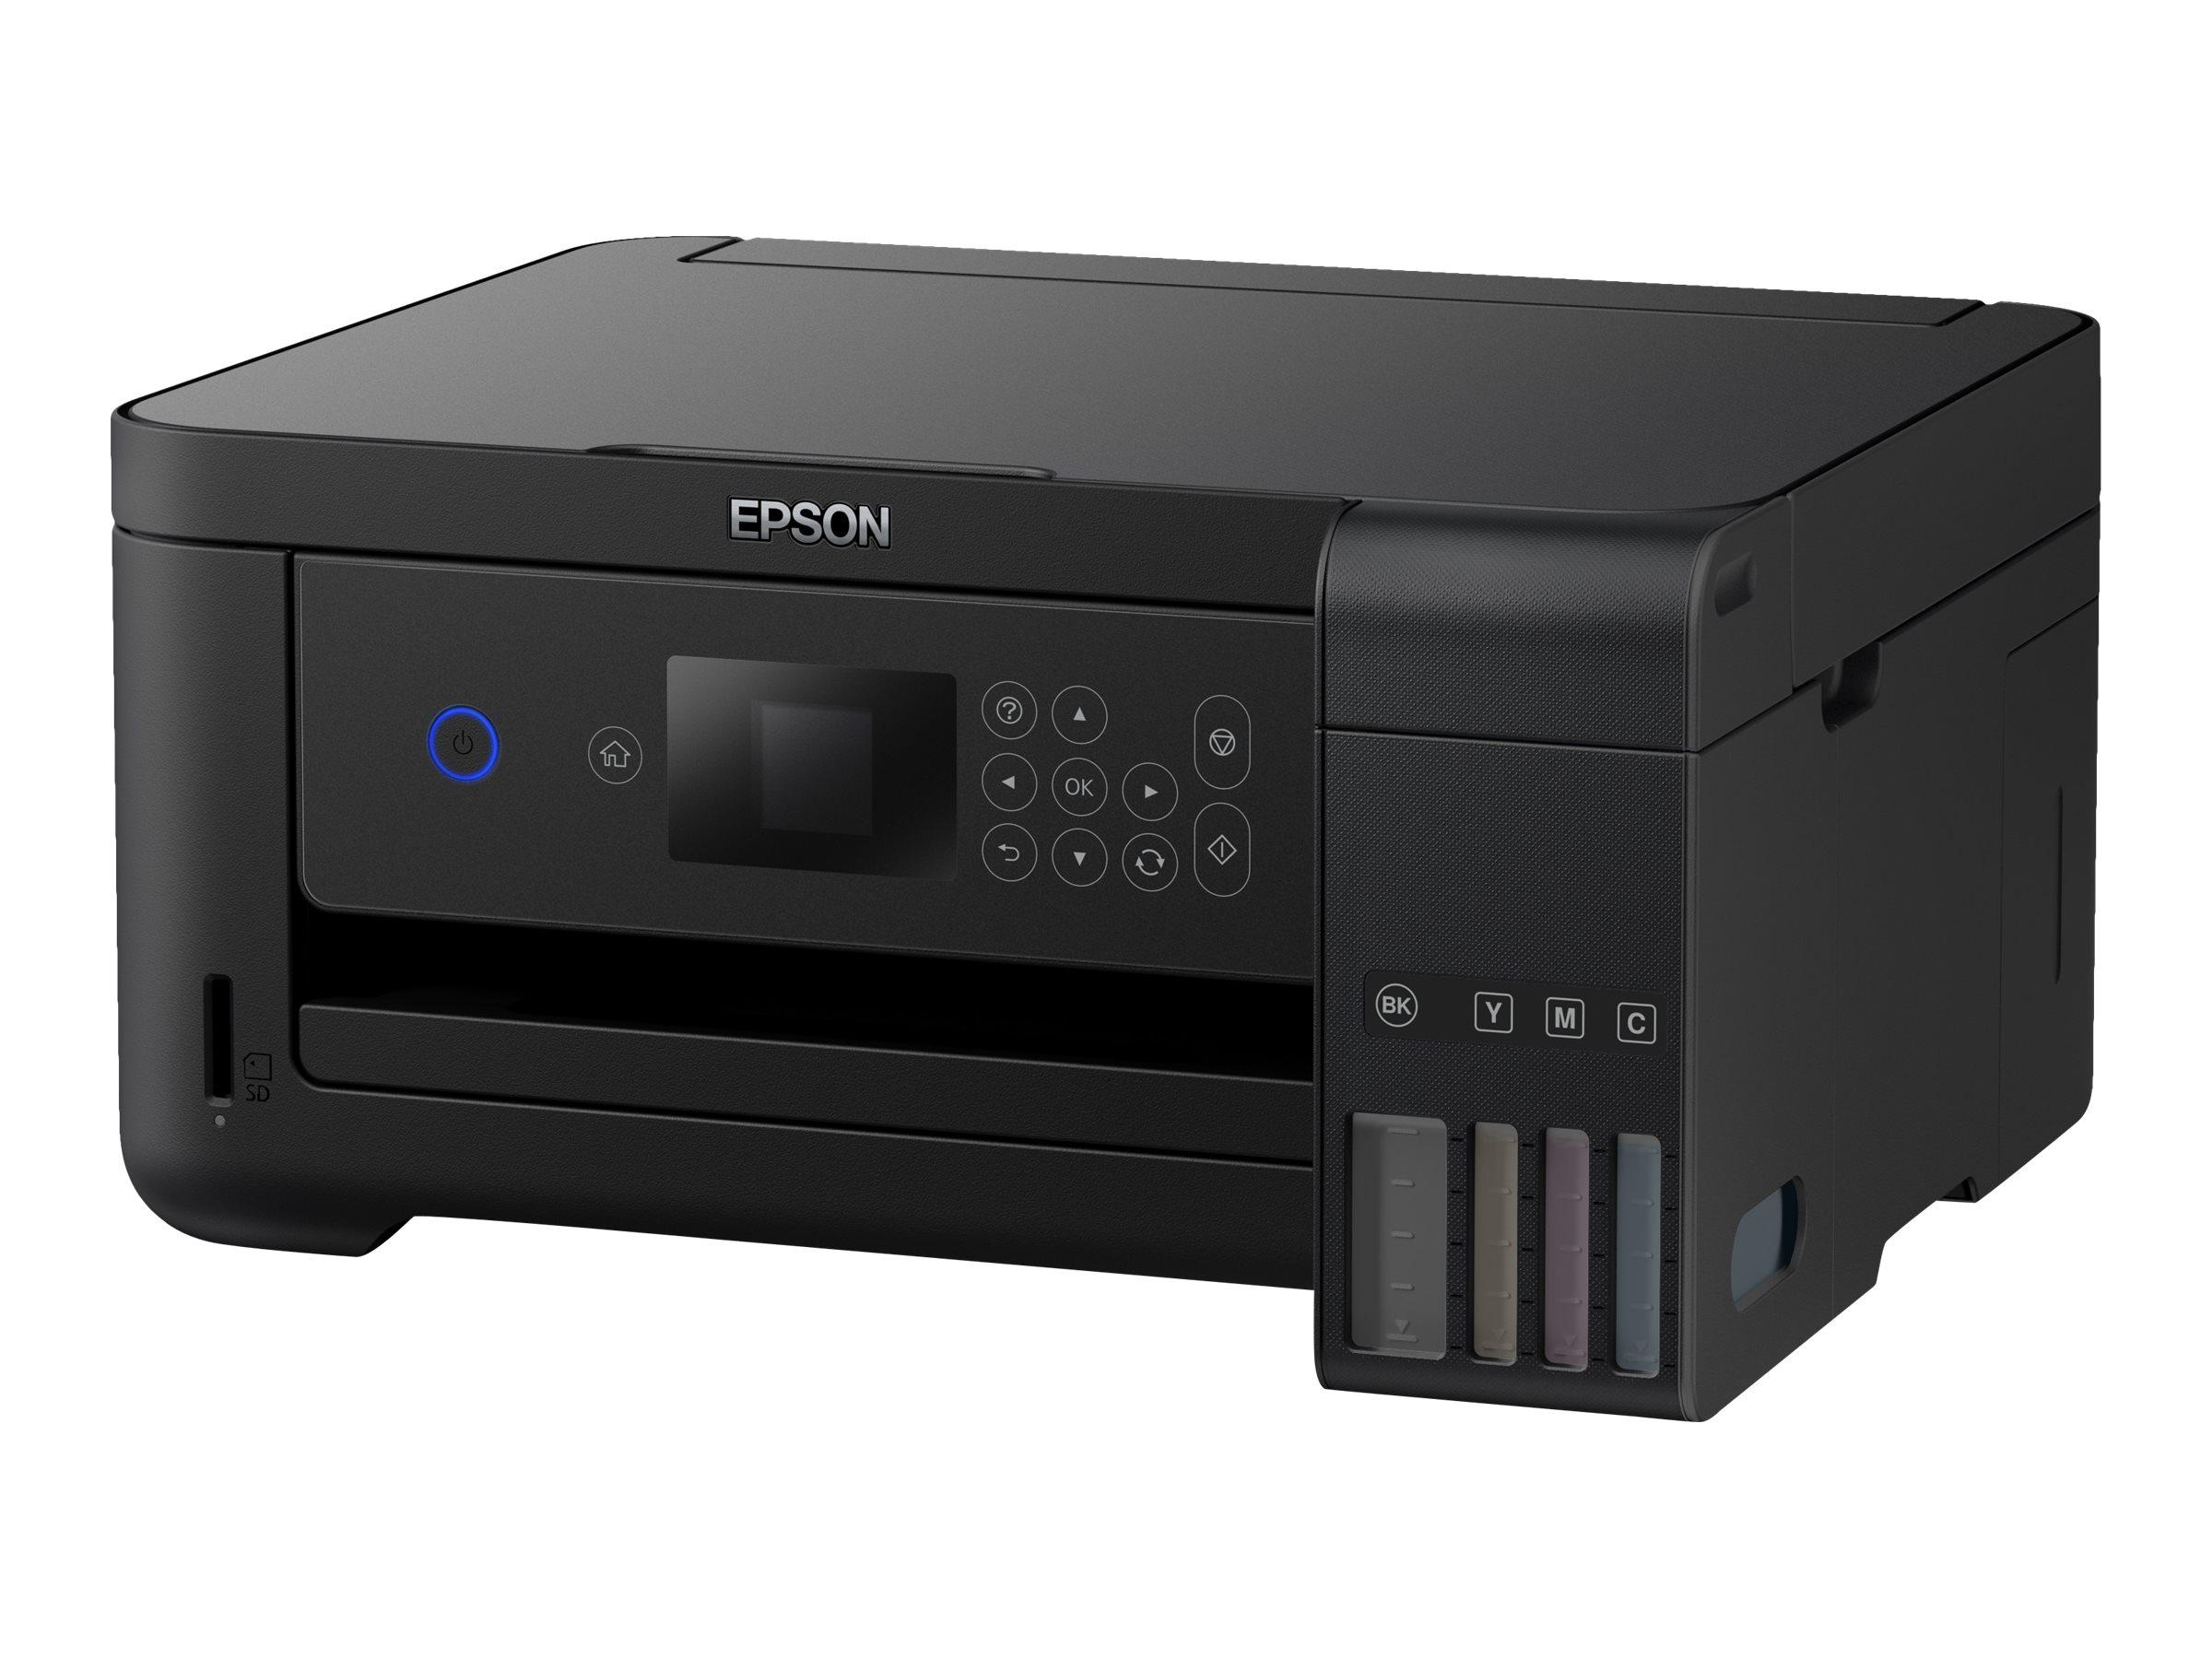 Epson EcoTank ET-2750 - Multifunktionsdrucker